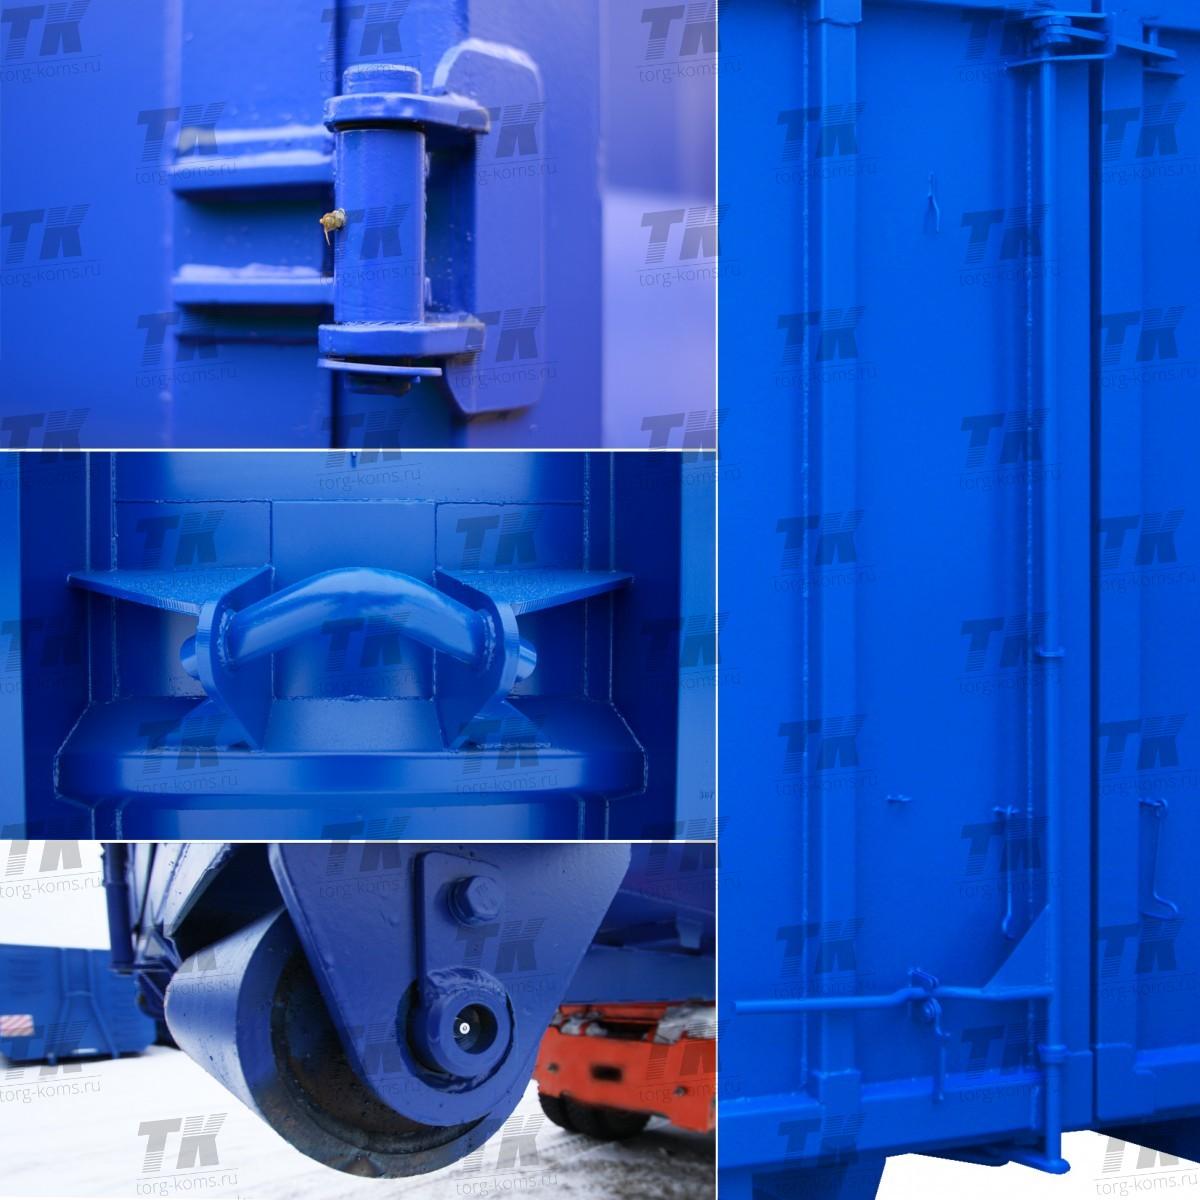 Контейнер для перевозки металлолома 36 куб. м.